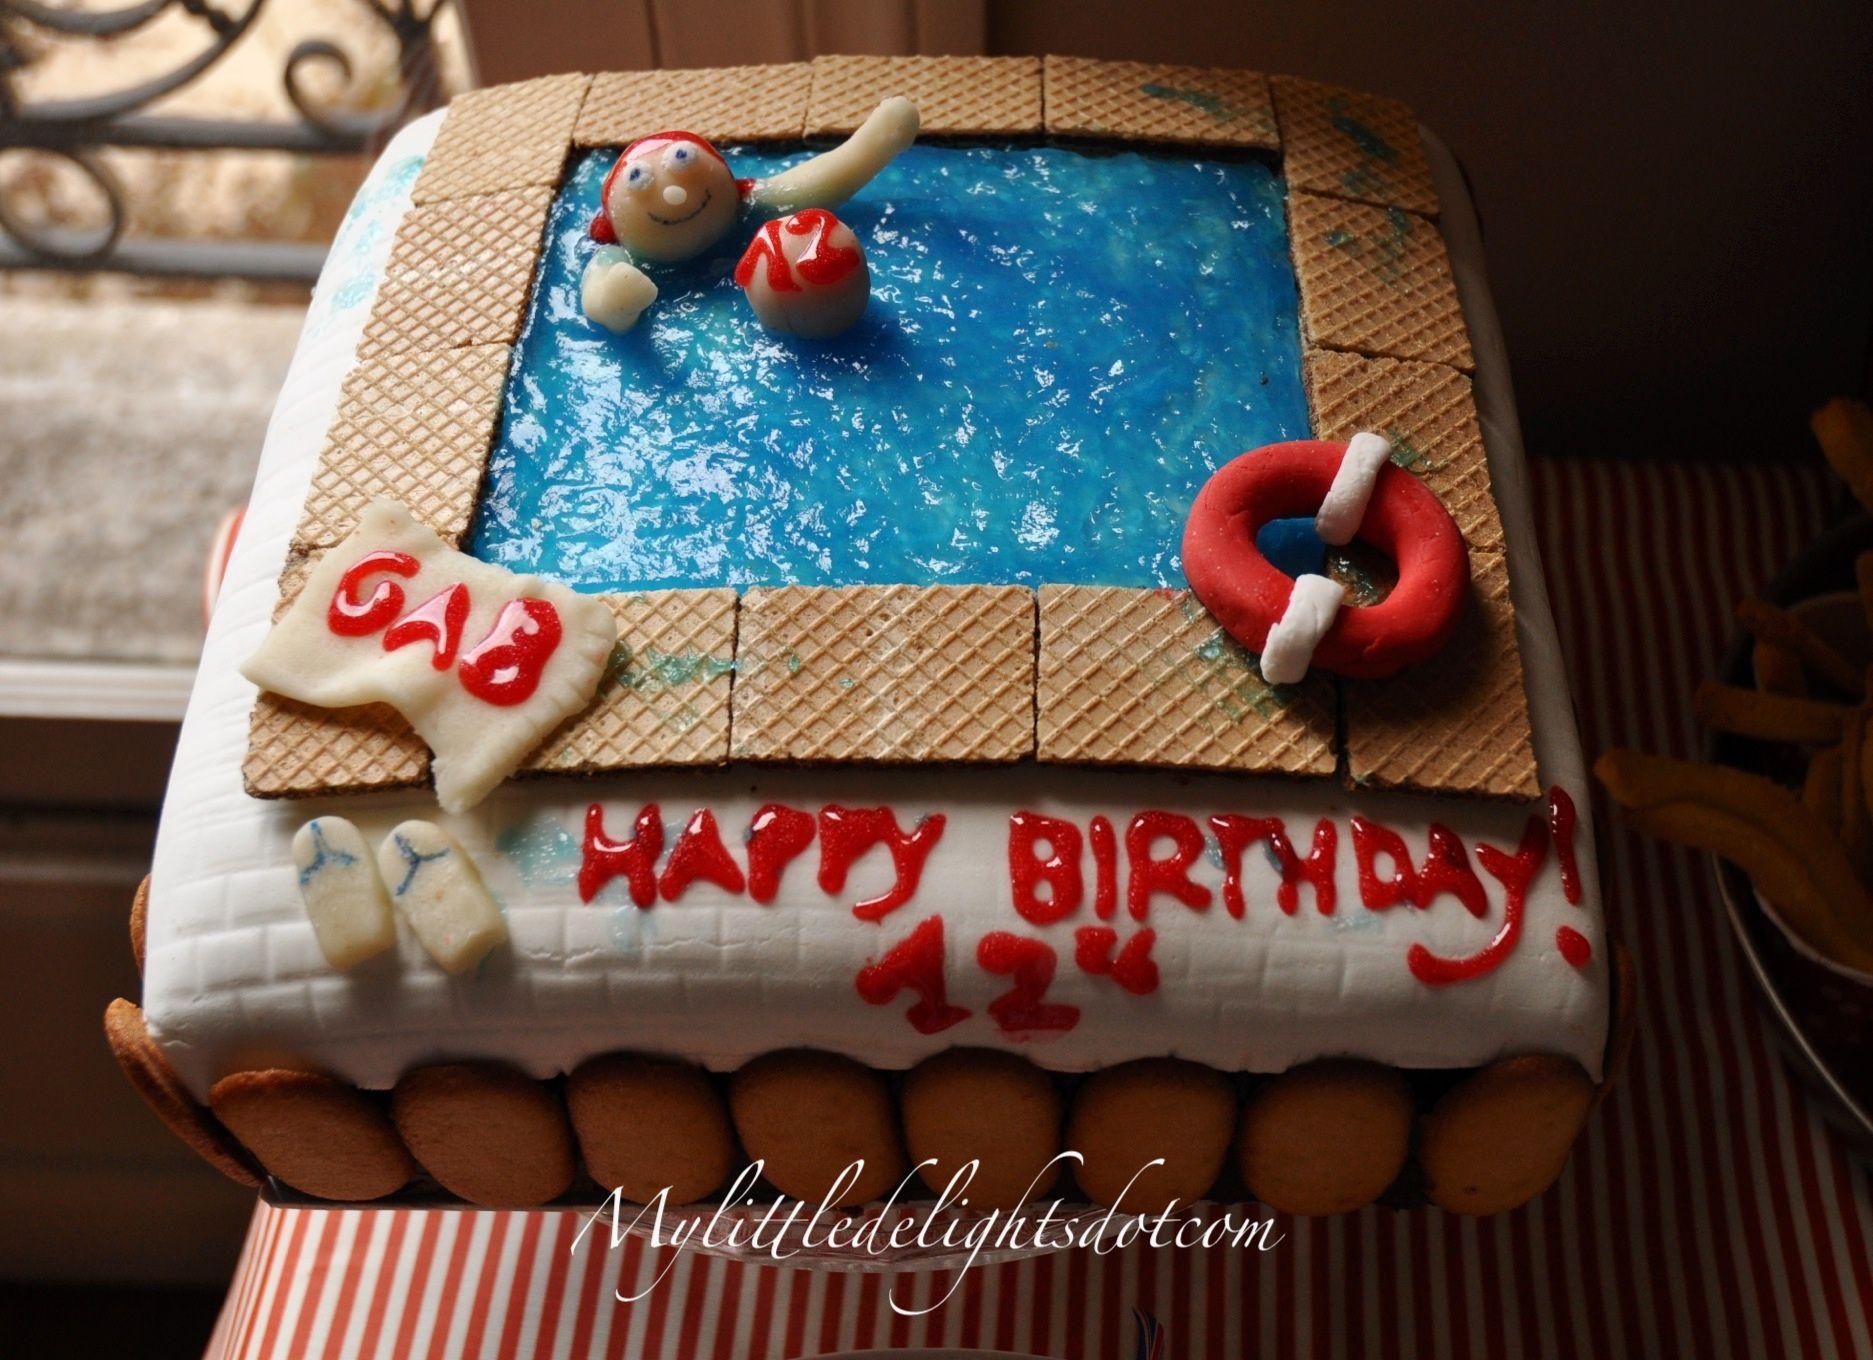 Et De Deux I Did It Again Birthday Cakes Pinterest Birthday